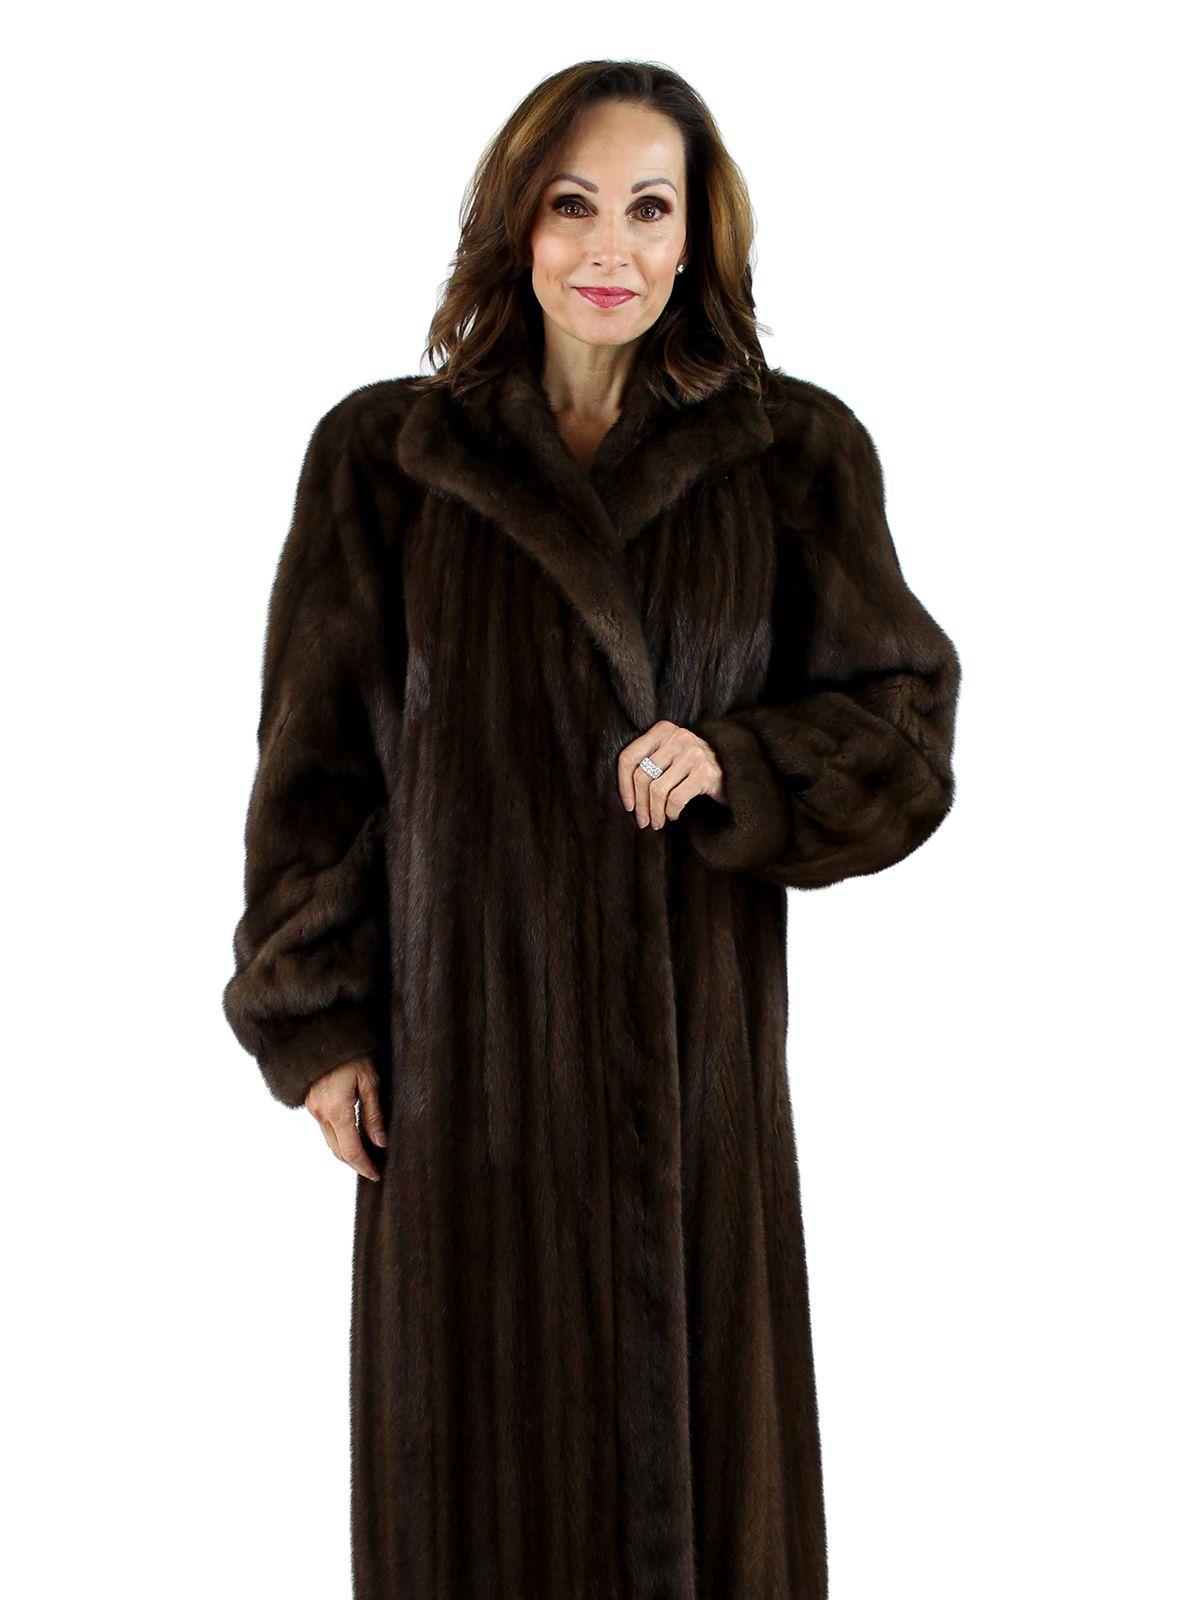 741f1d18f Lunaraine Female Mink Fur Coat - Women's Large in 2019 | clothes ...